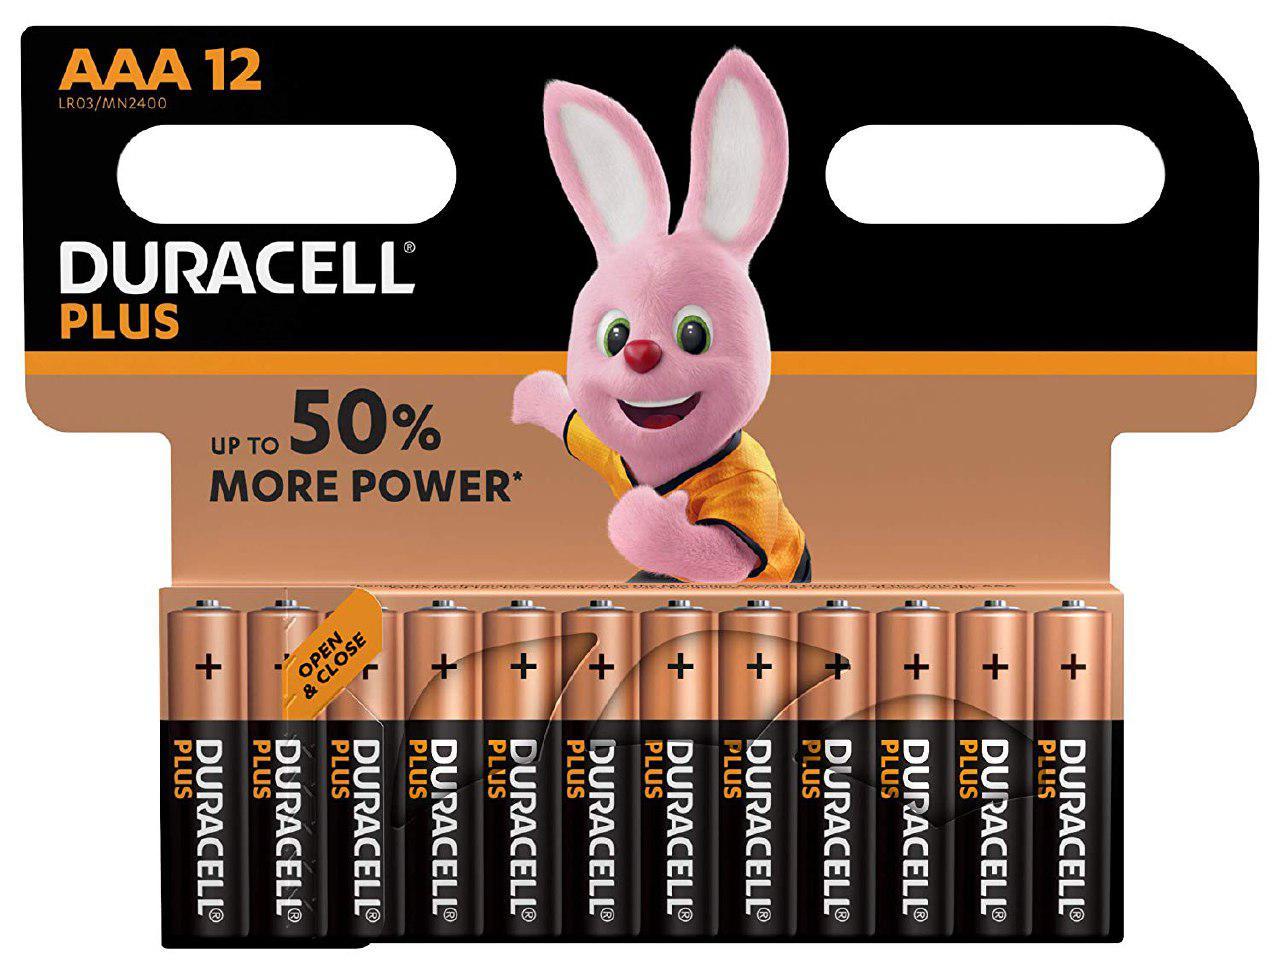 12 pilas Duracell plus AA baratas